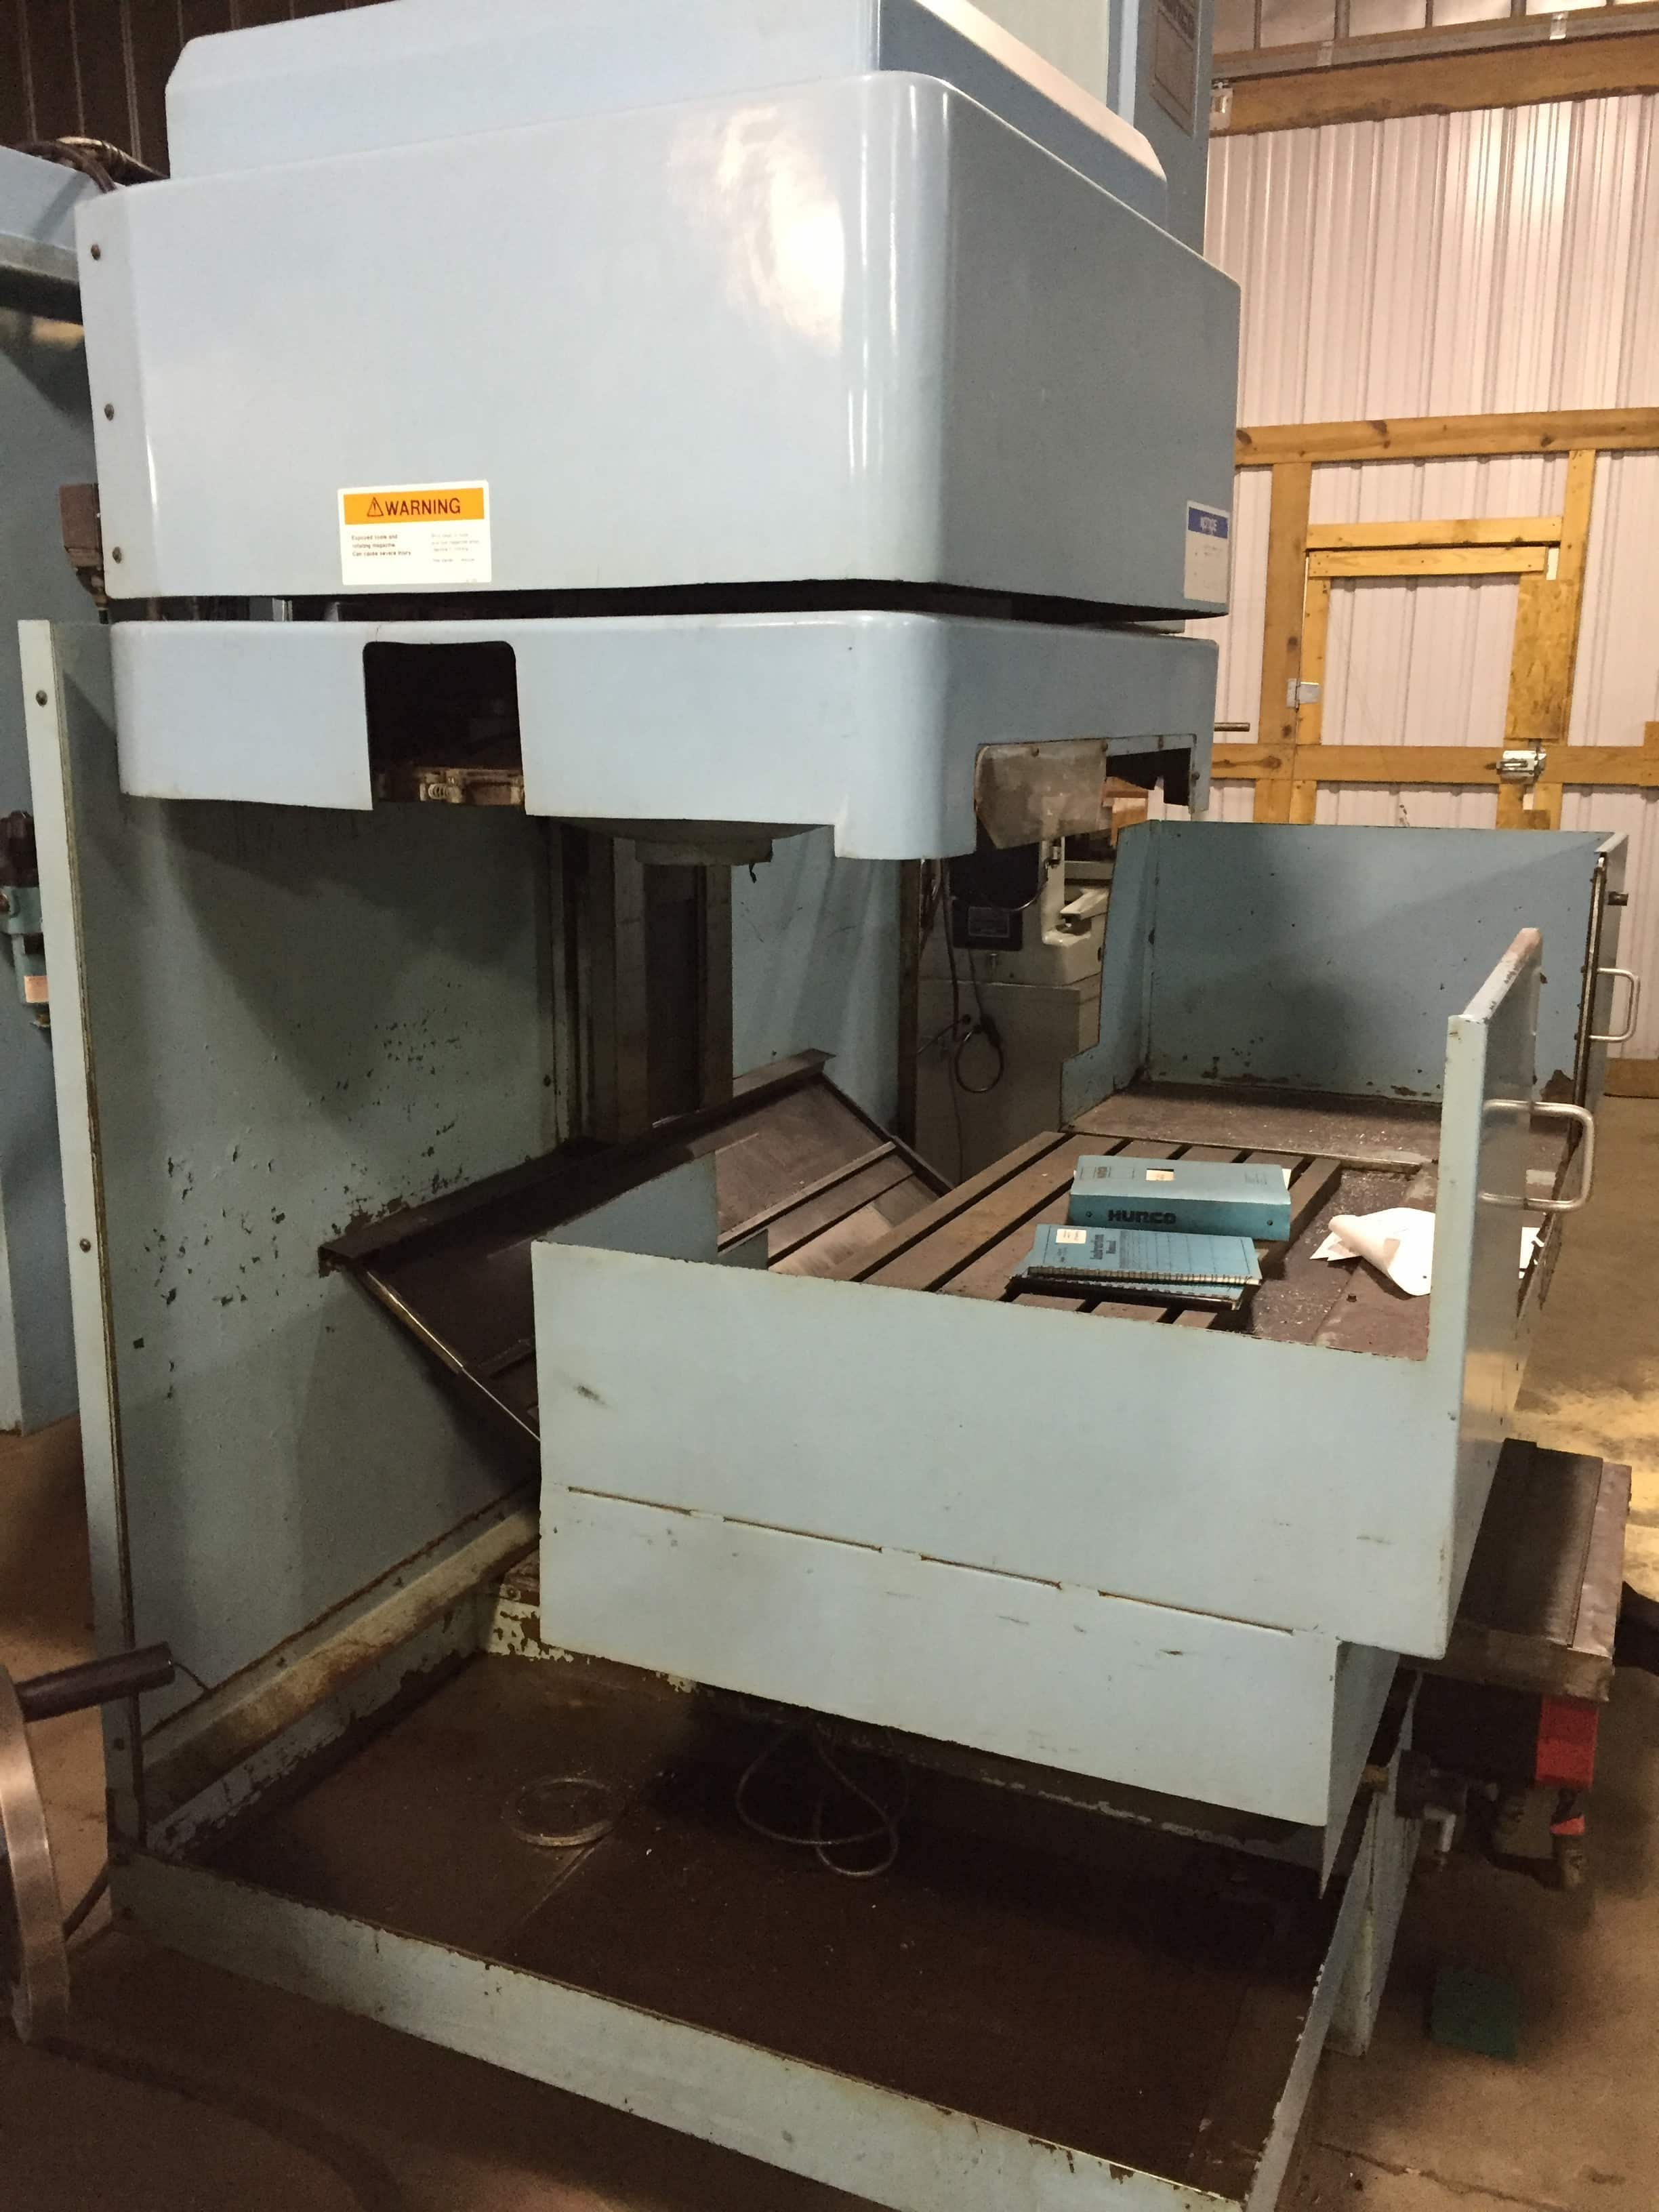 Lot 19 - Hurco BMC30 CNC Vertical Machining Center, S/N BC-8007059-J, New 1989